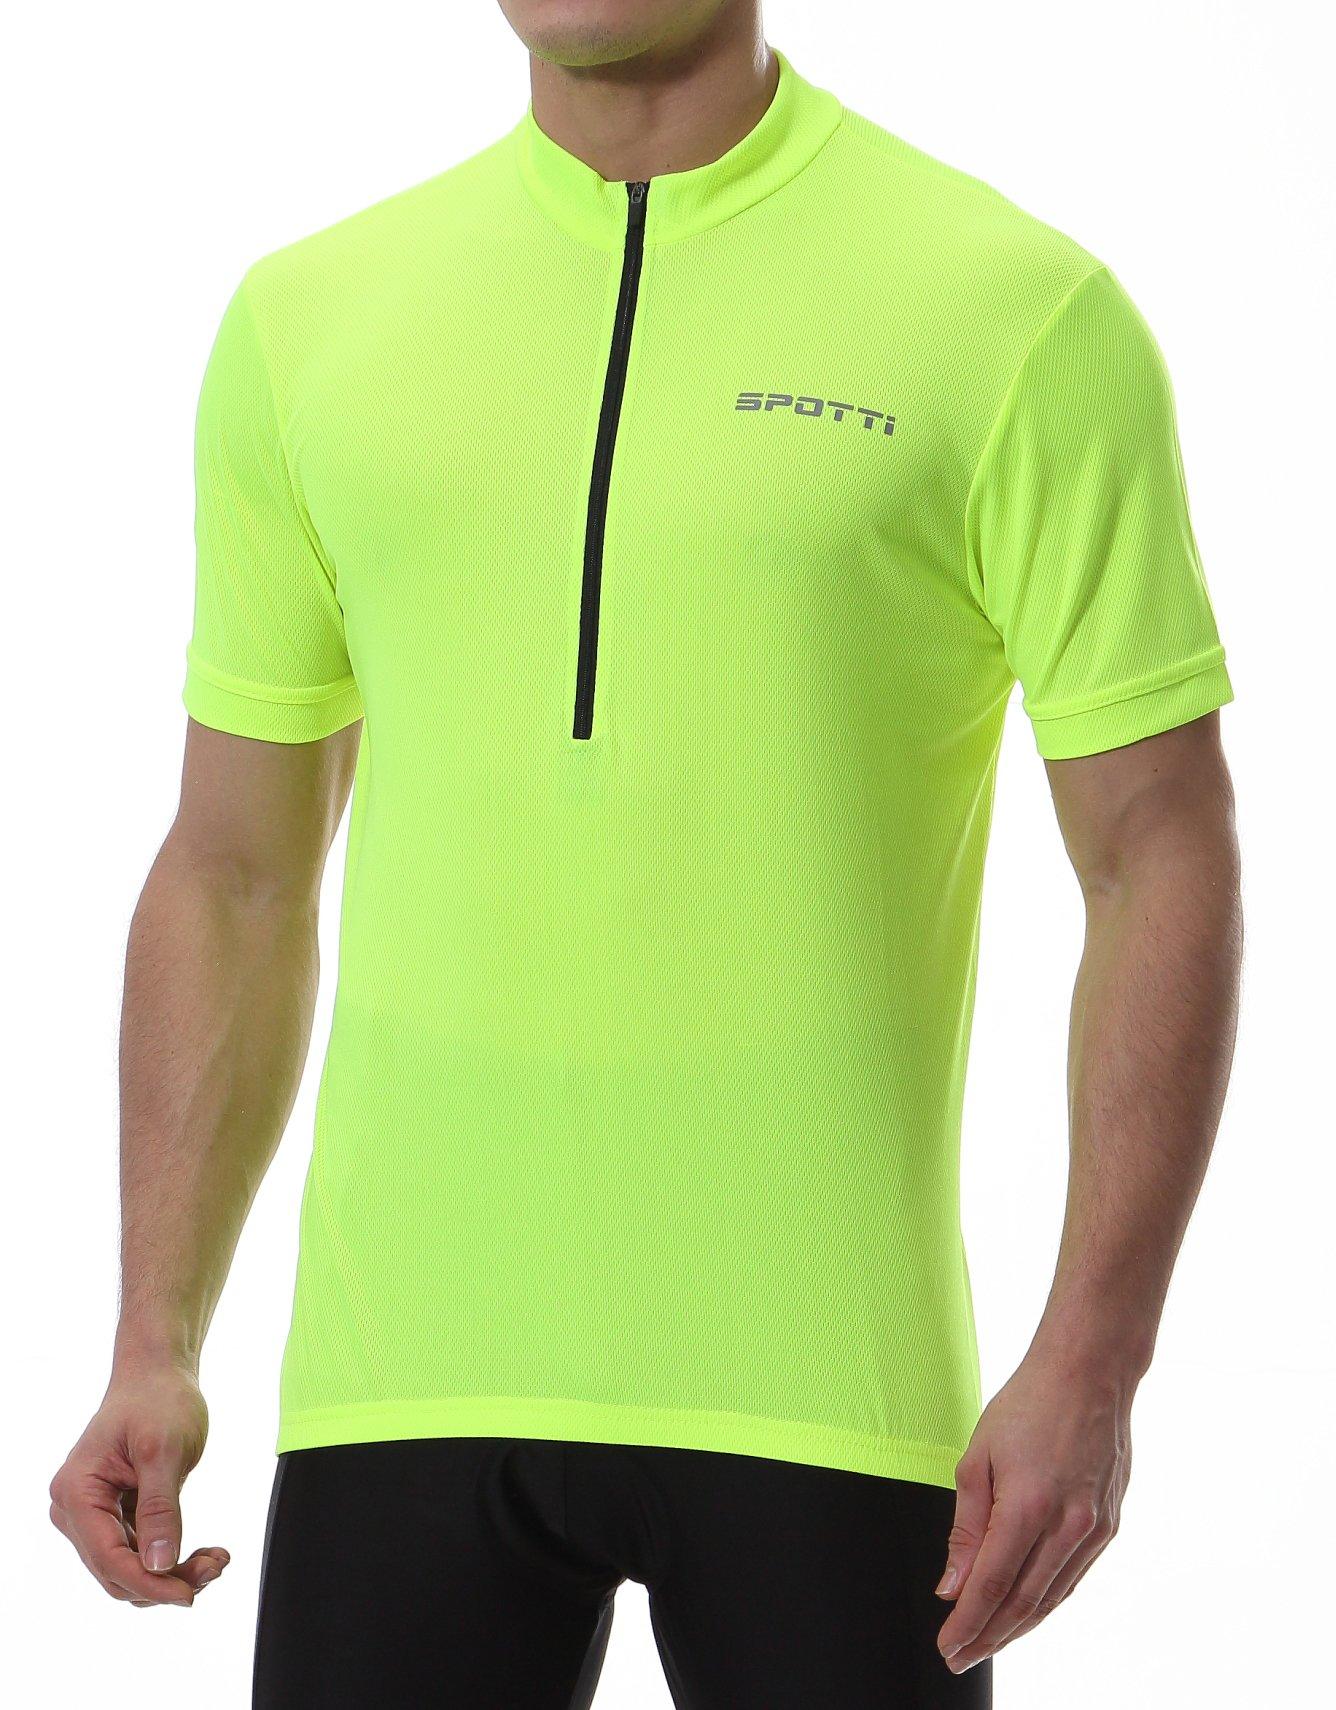 Spotti Men s Cycling Bike Jersey Short Sleeve with 3 Rear Pockets- Moisture  Wicking 3dc43cbad